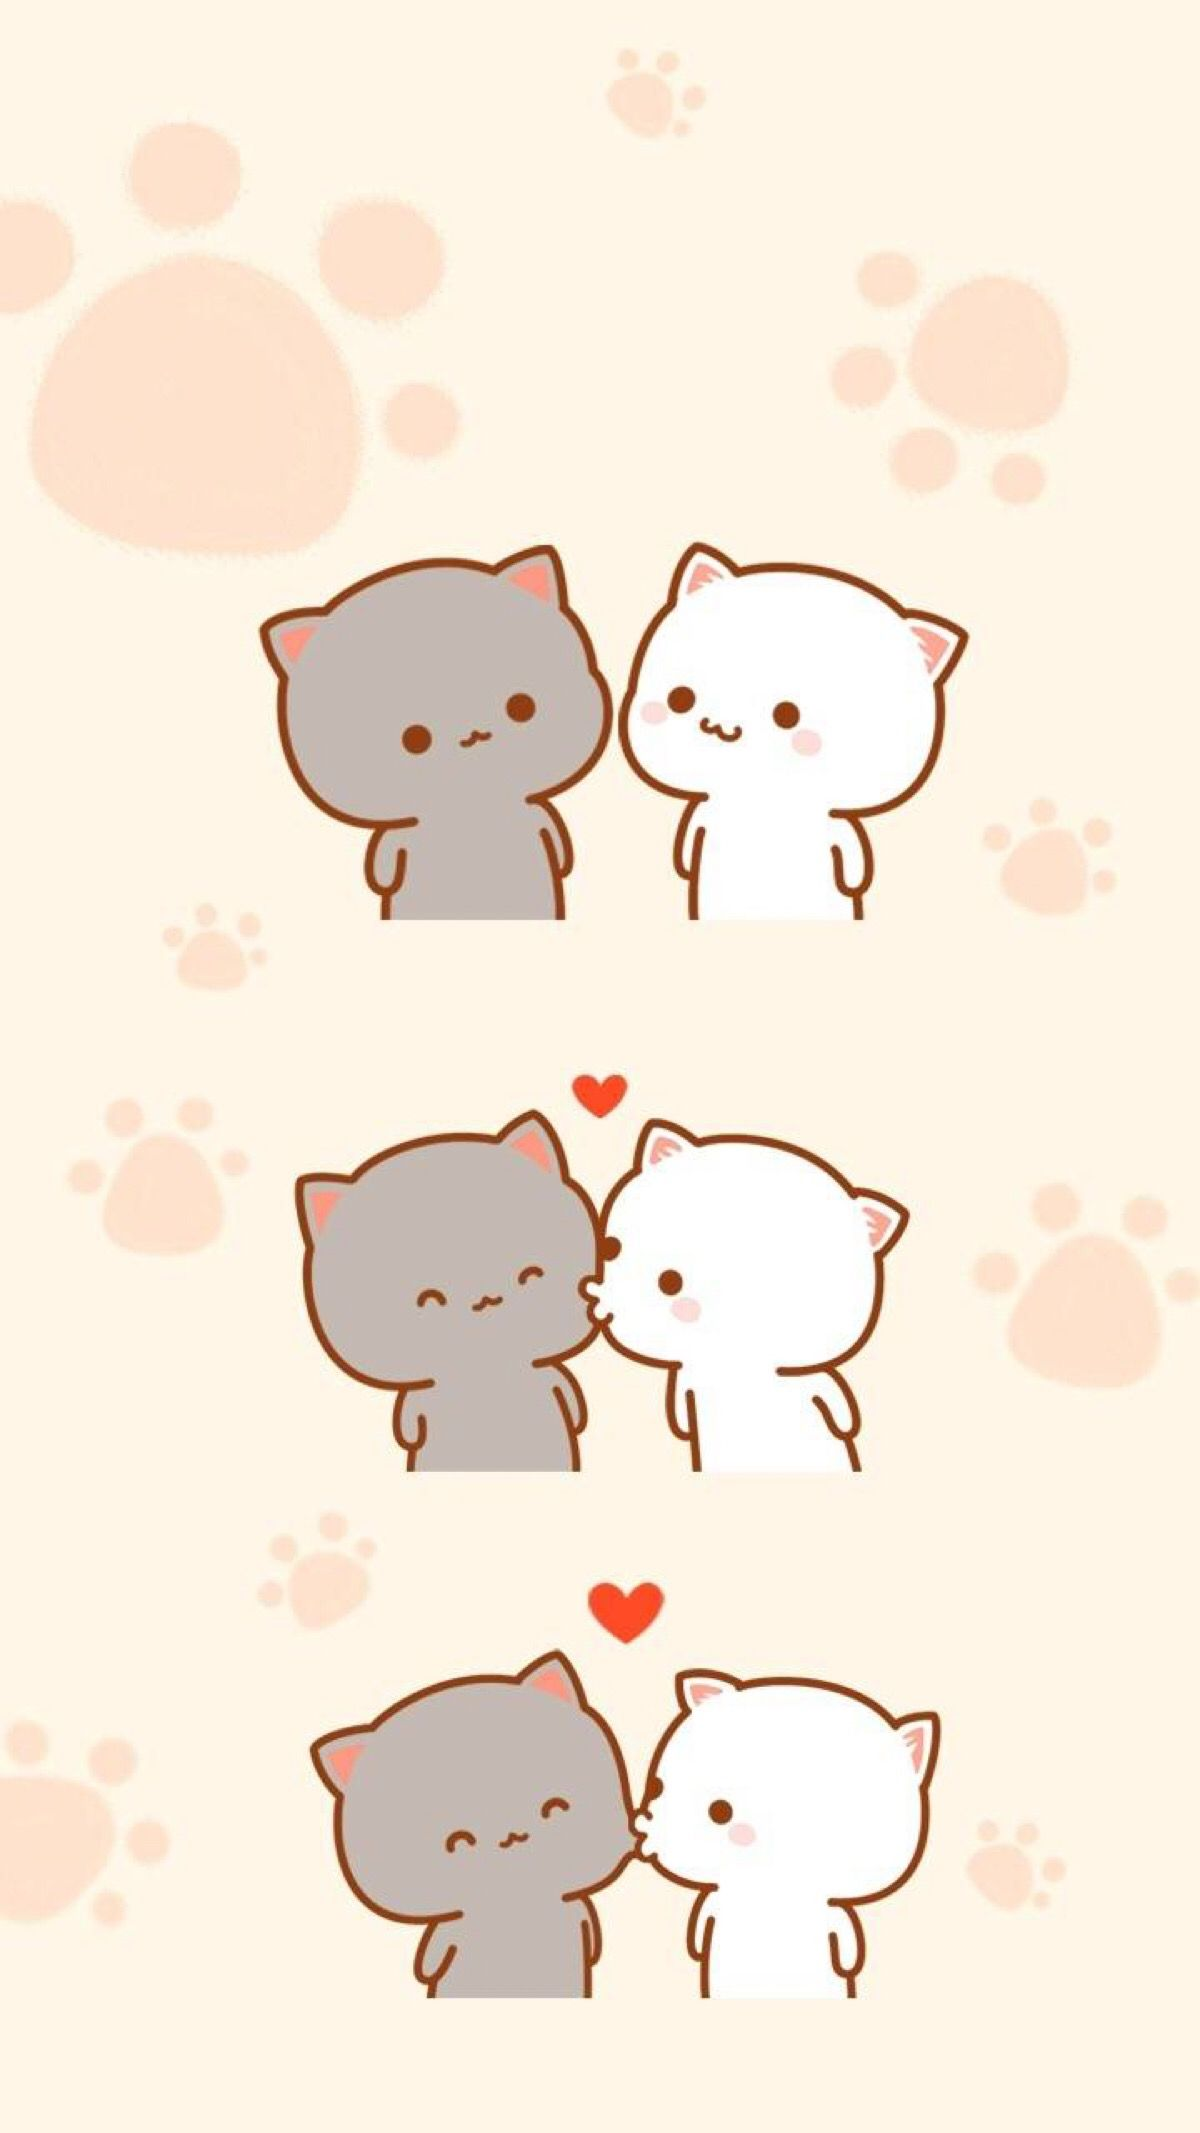 Pin Oleh Andrea Arrazolass Di Love Wallpaper Kartun Seni Kucing Anak Kucing